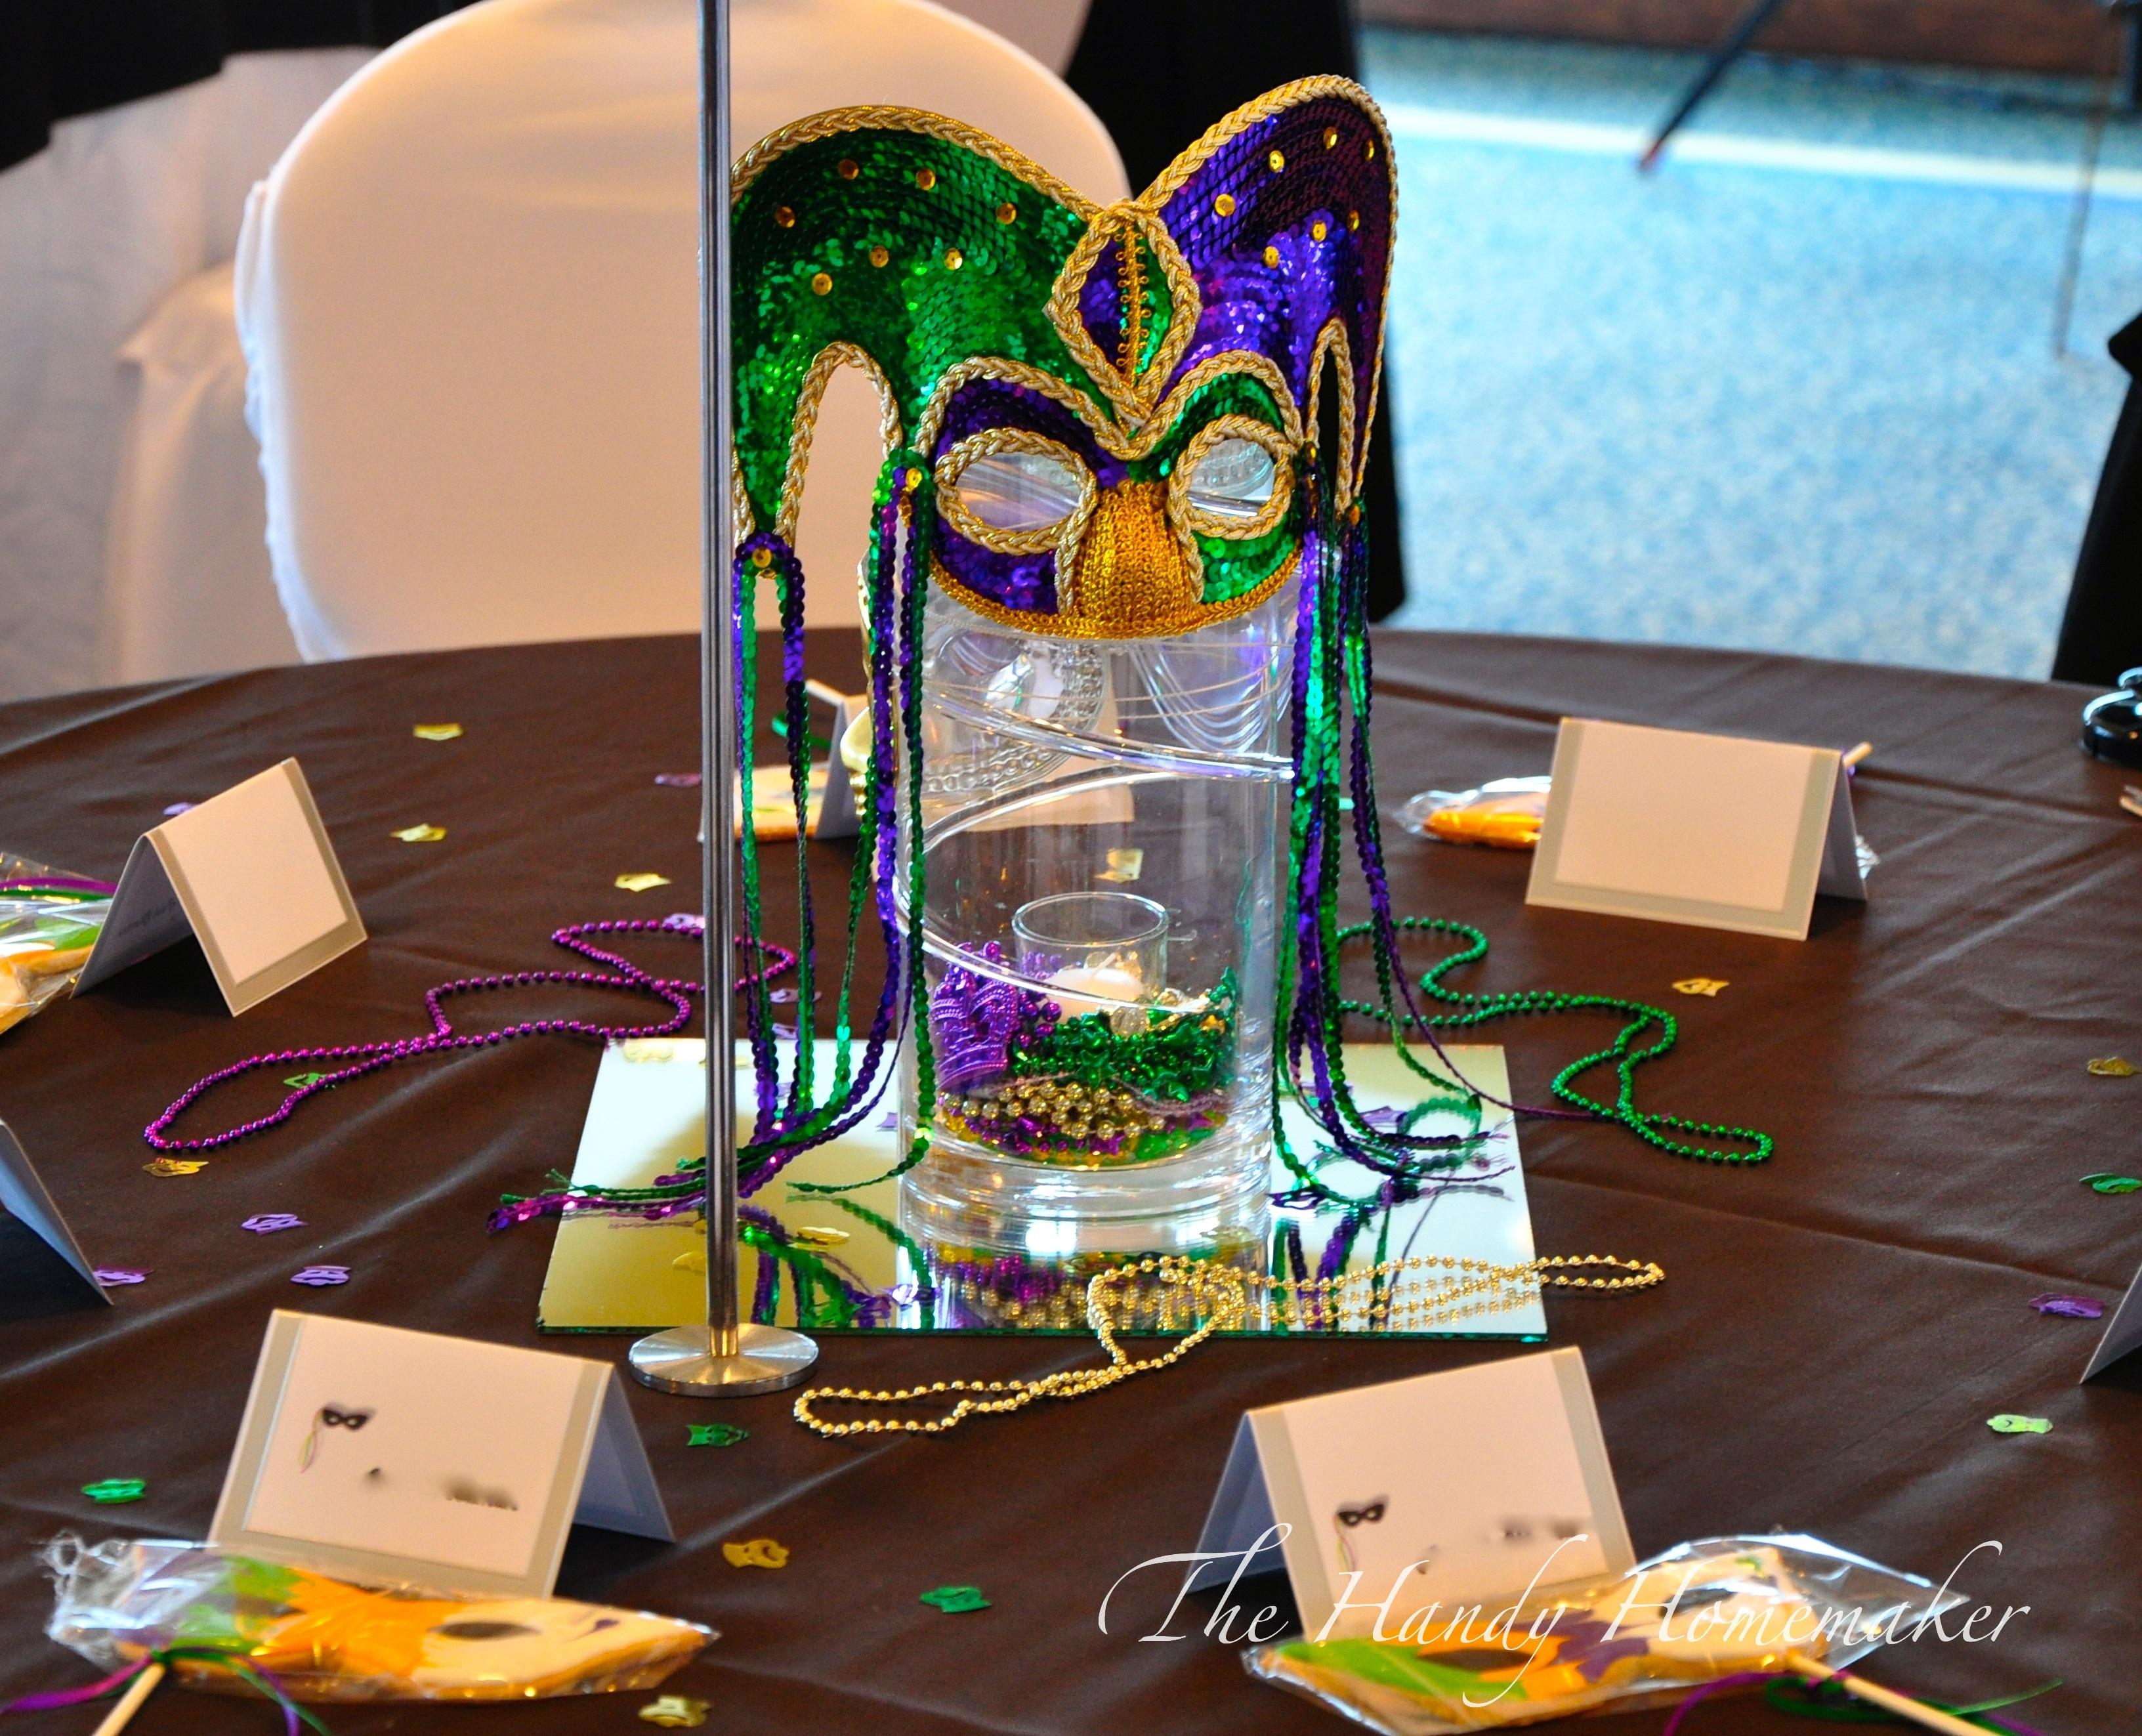 Mardi gras masquerade party dsc3297 amipublicfo Images